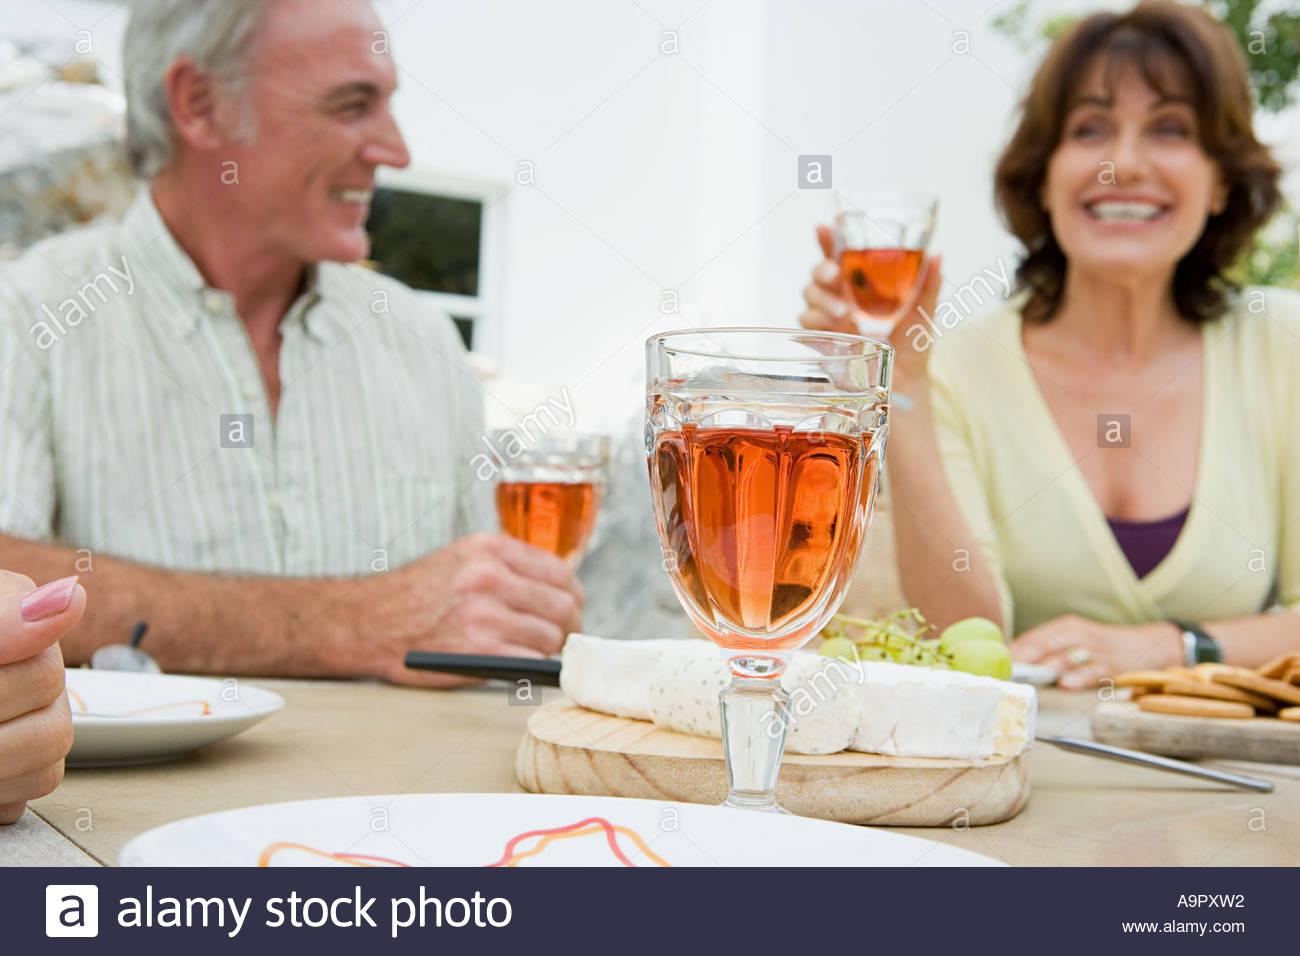 Senior adults drinking wine - Stock Image